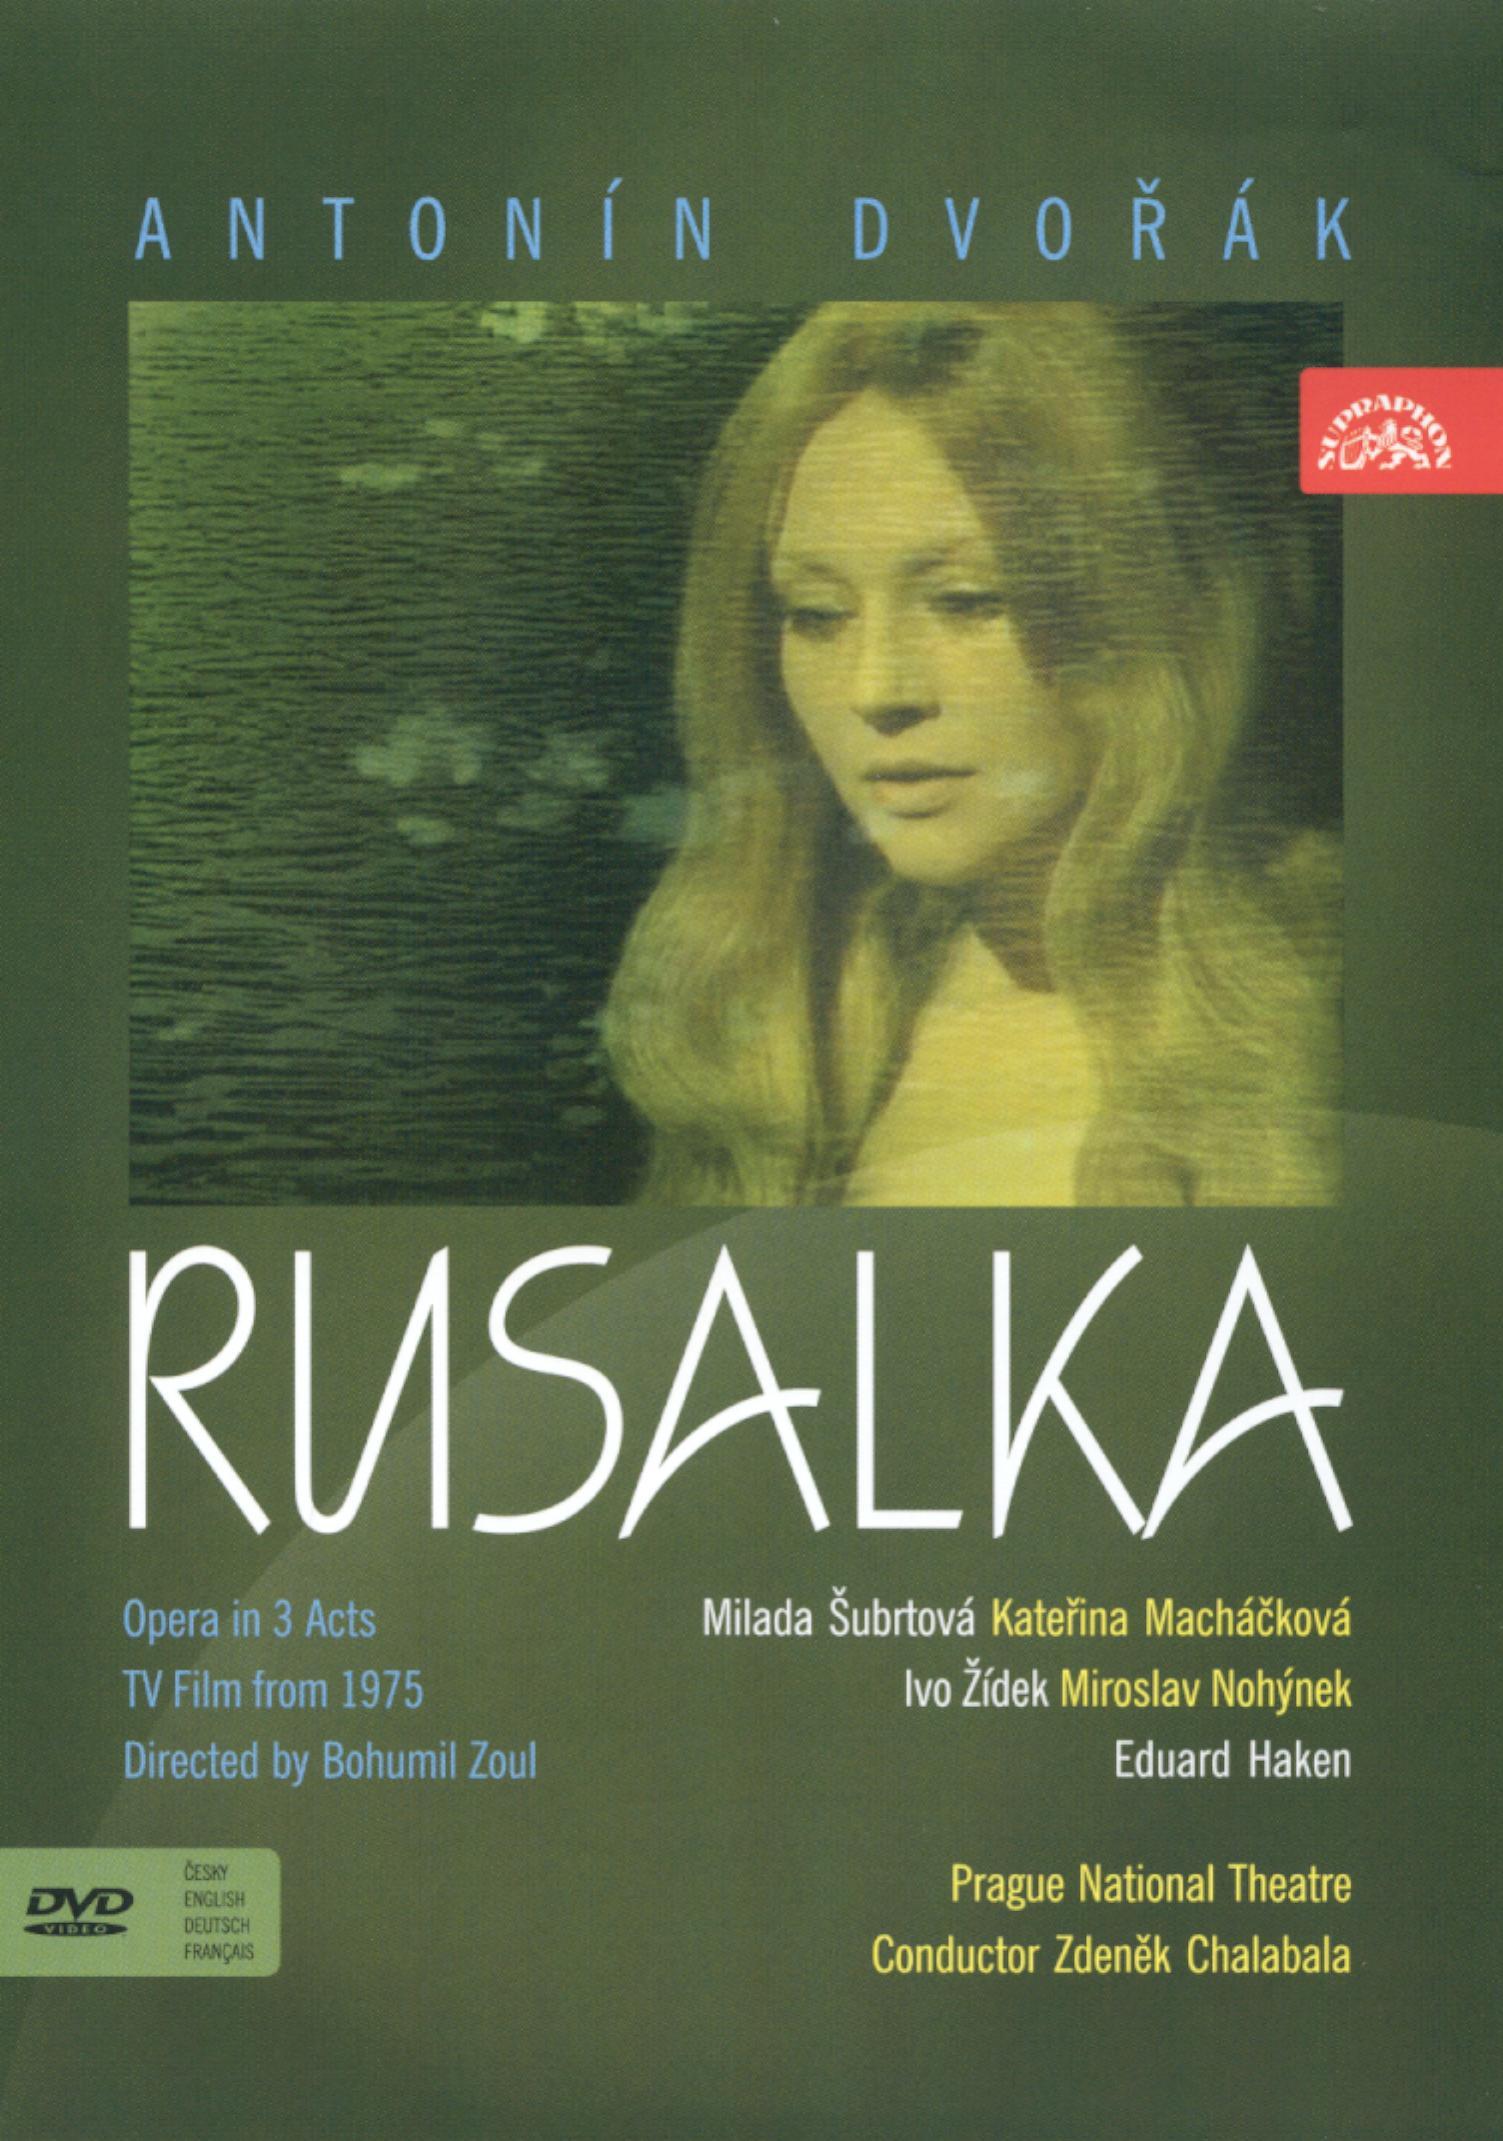 Rusalka (Prague National Theatre)